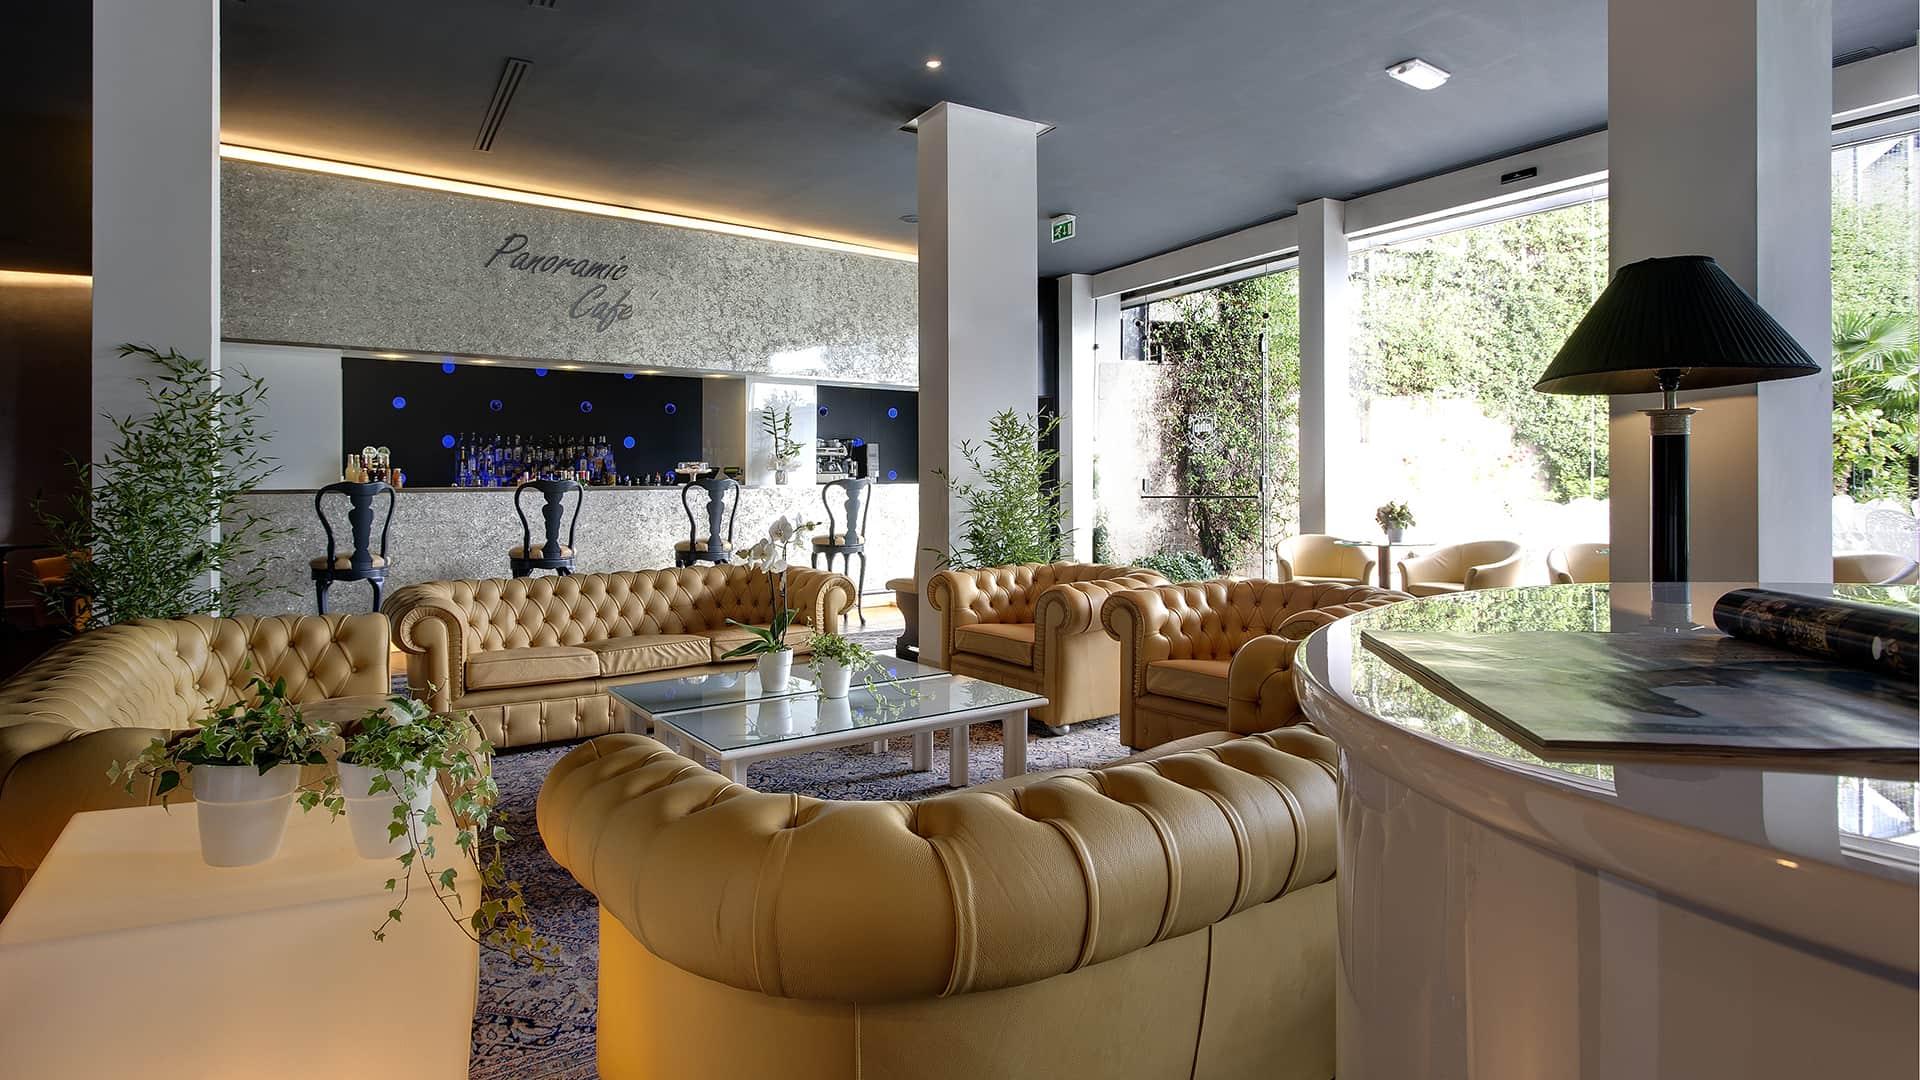 Panoramic Cafe